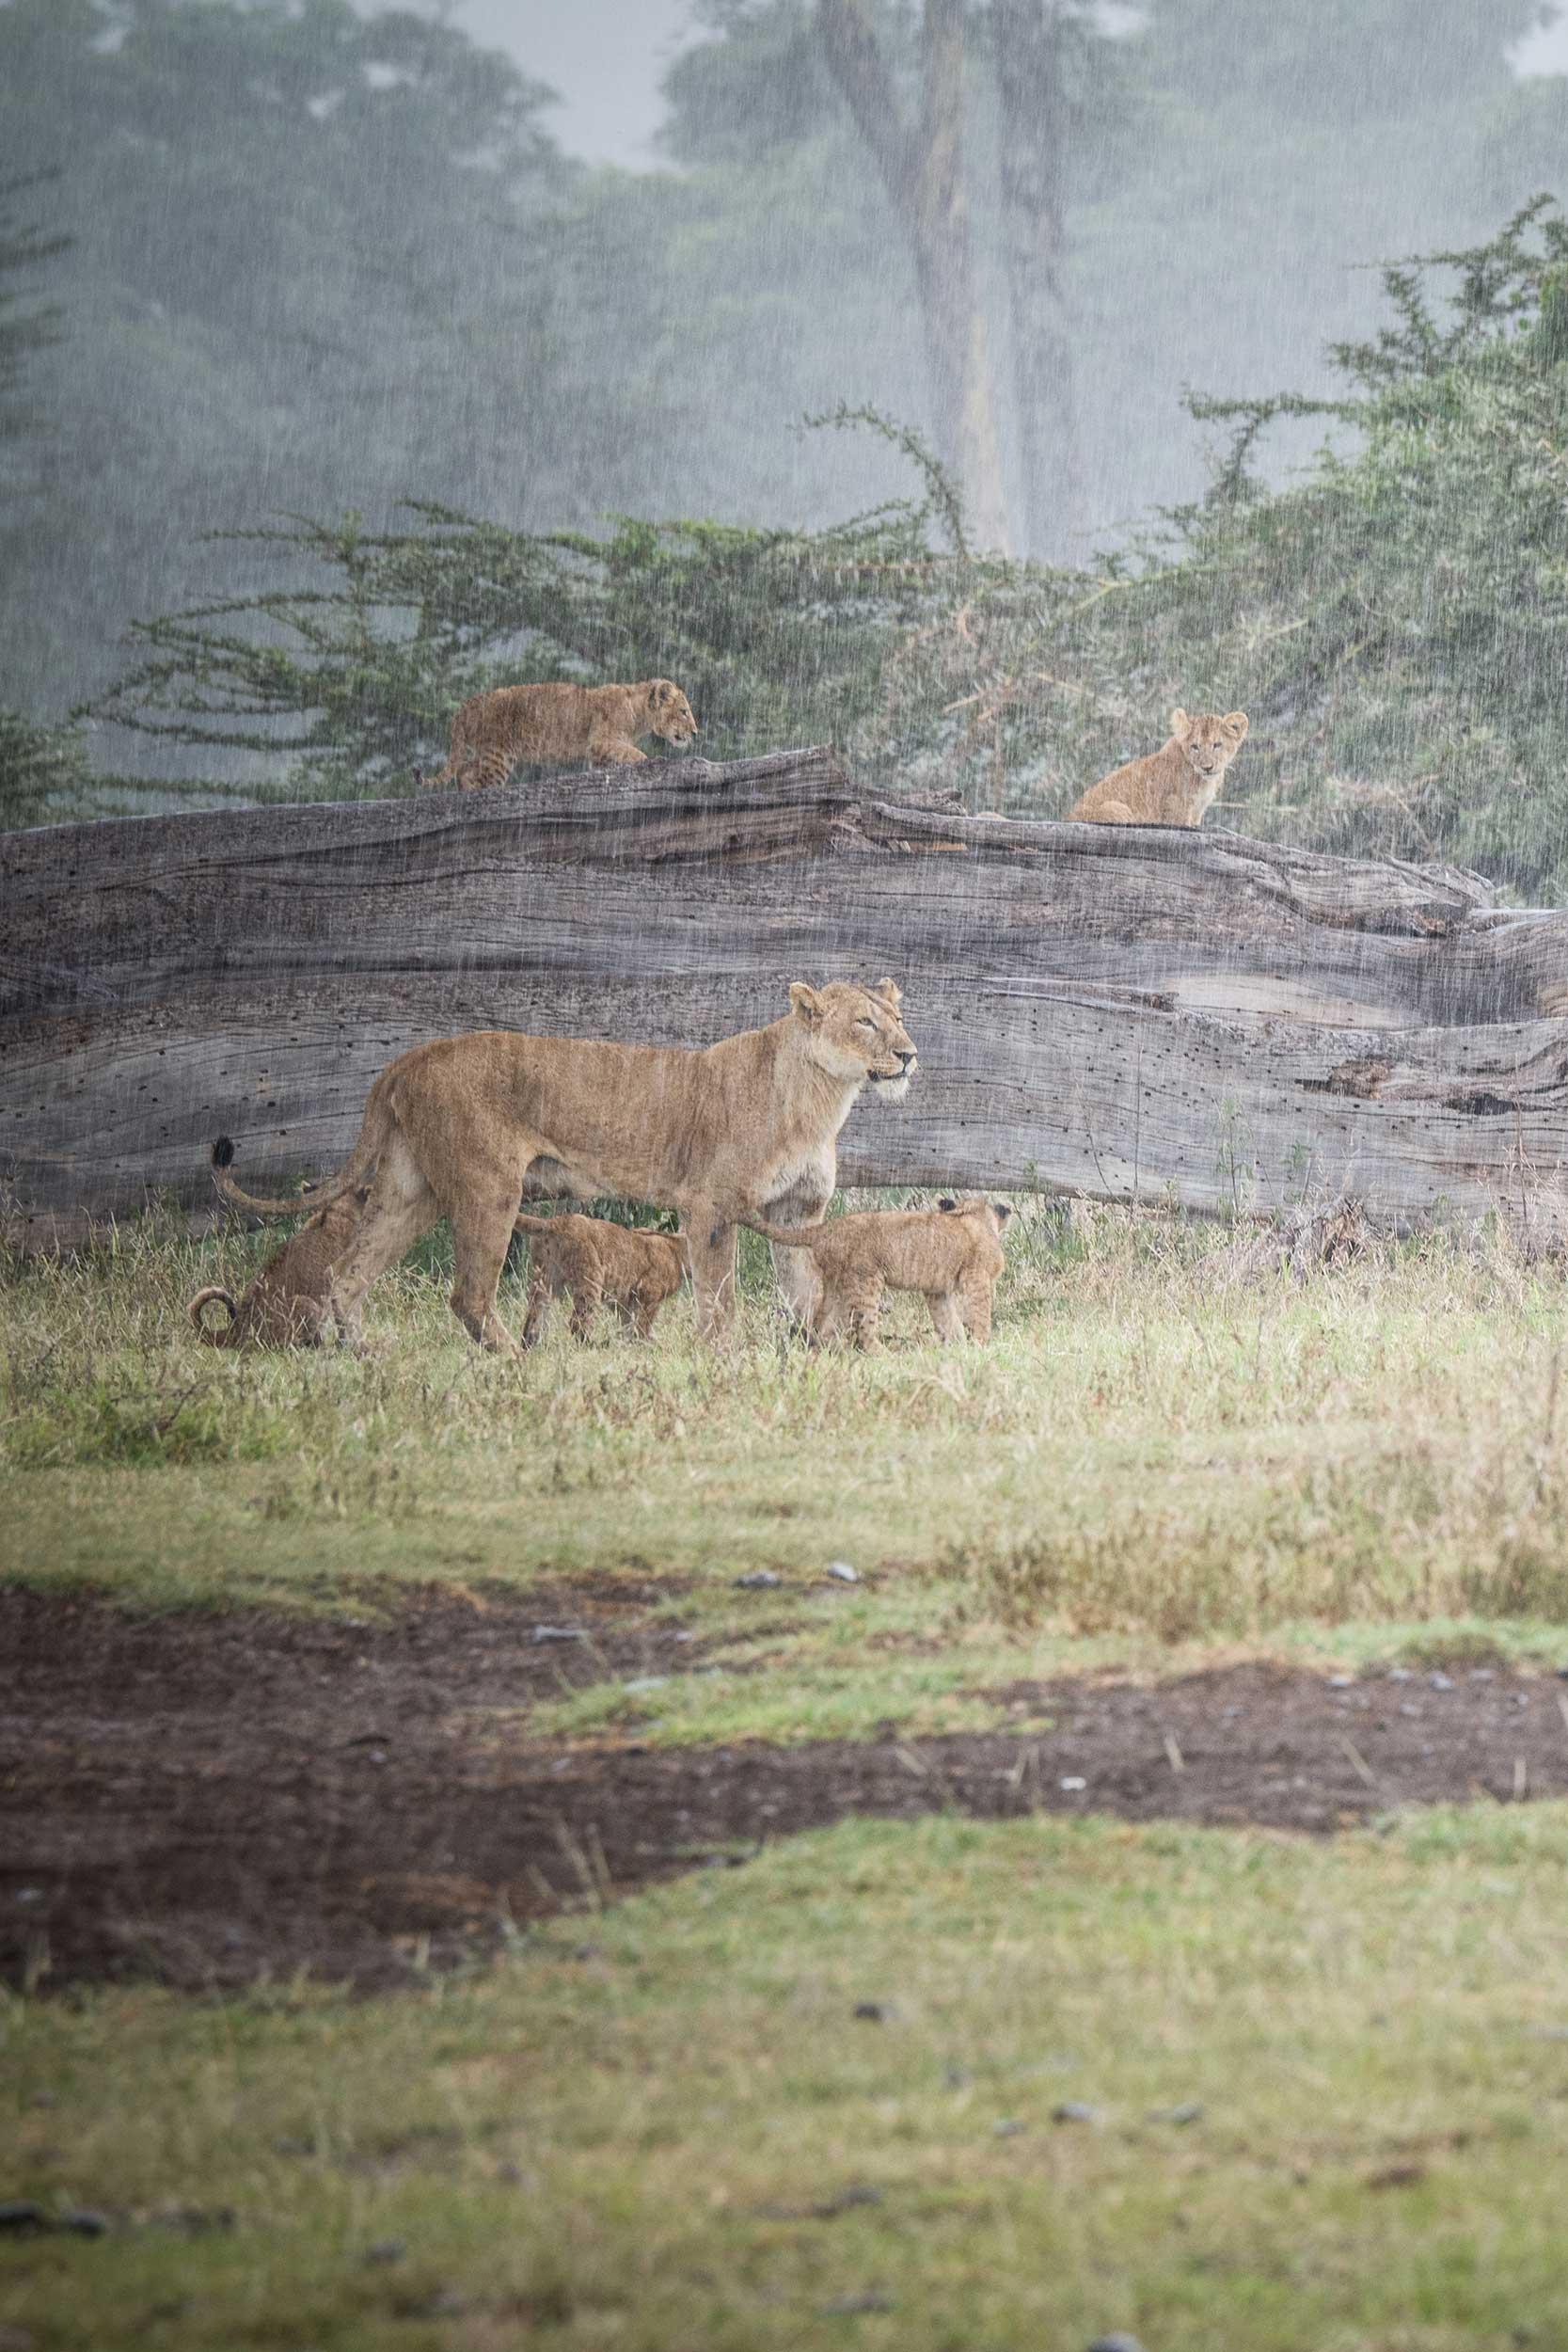 UNTOLD-Journal-Tanzania-008.jpg